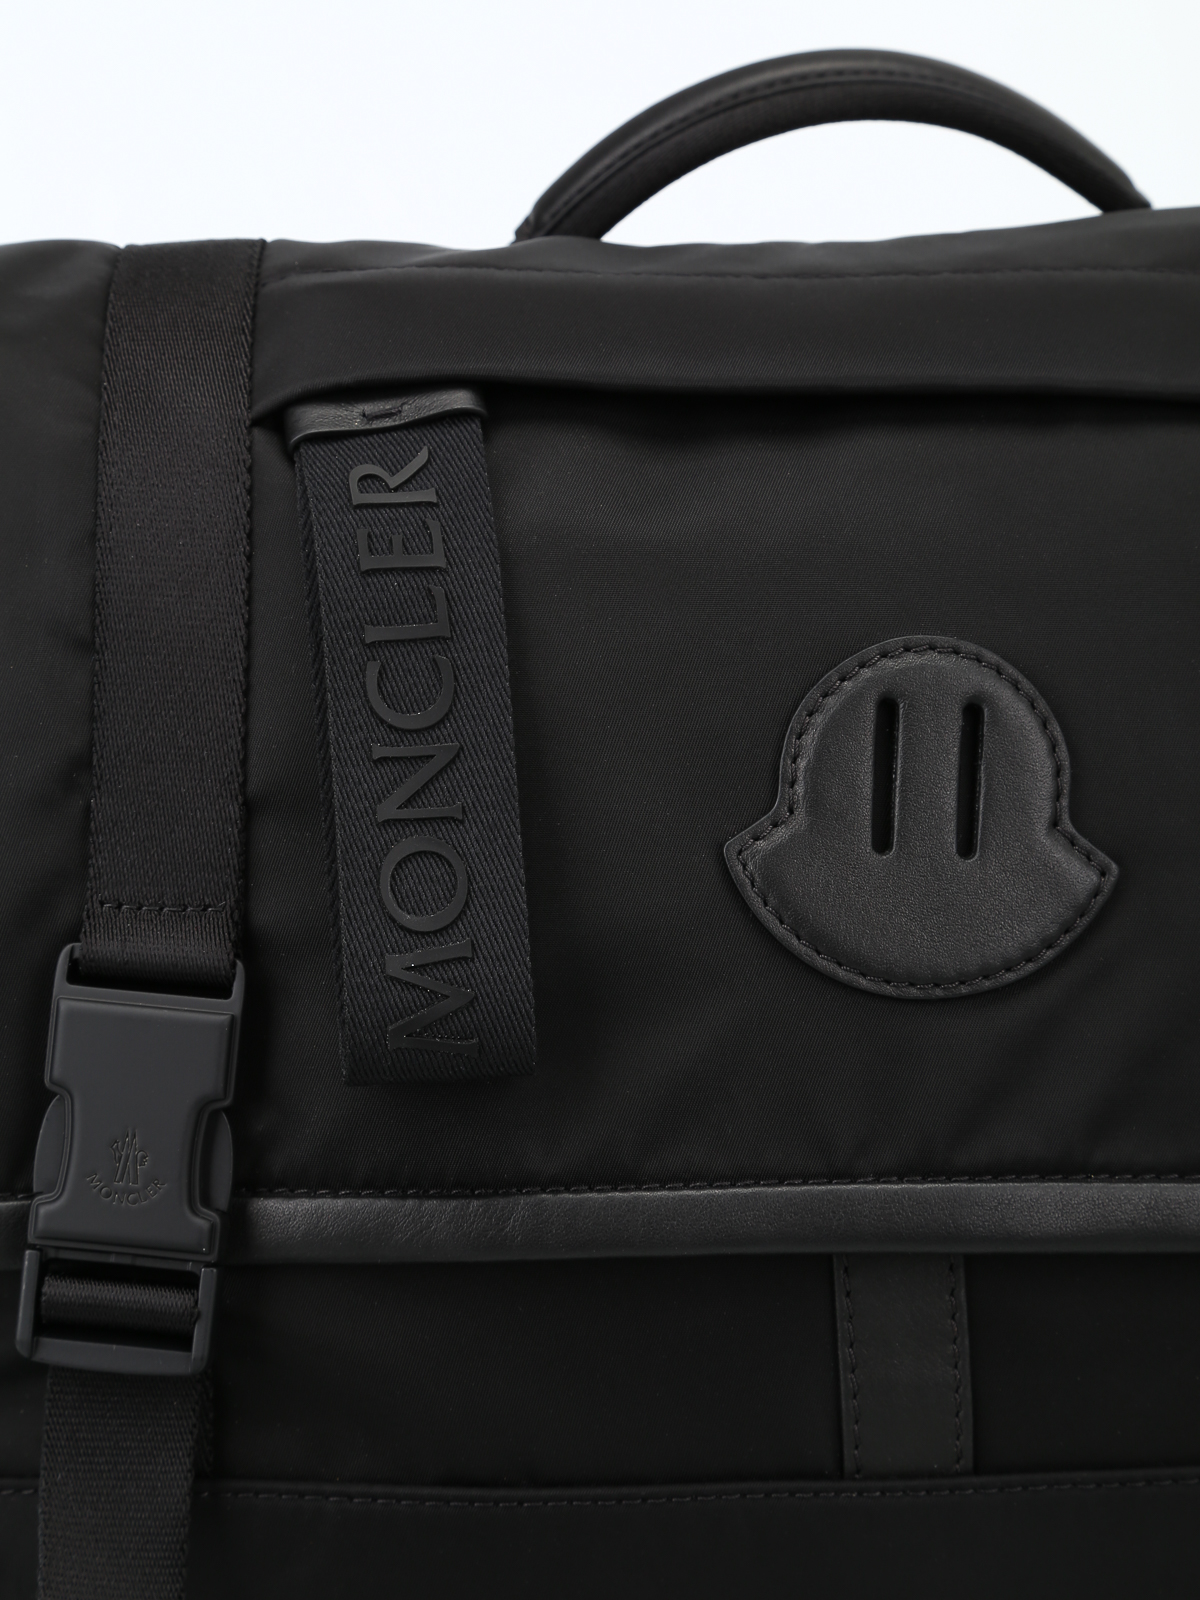 finest selection ca22e 56fb9 Moncler - Stratus black nylon bag - laptop bags & briefcases ...